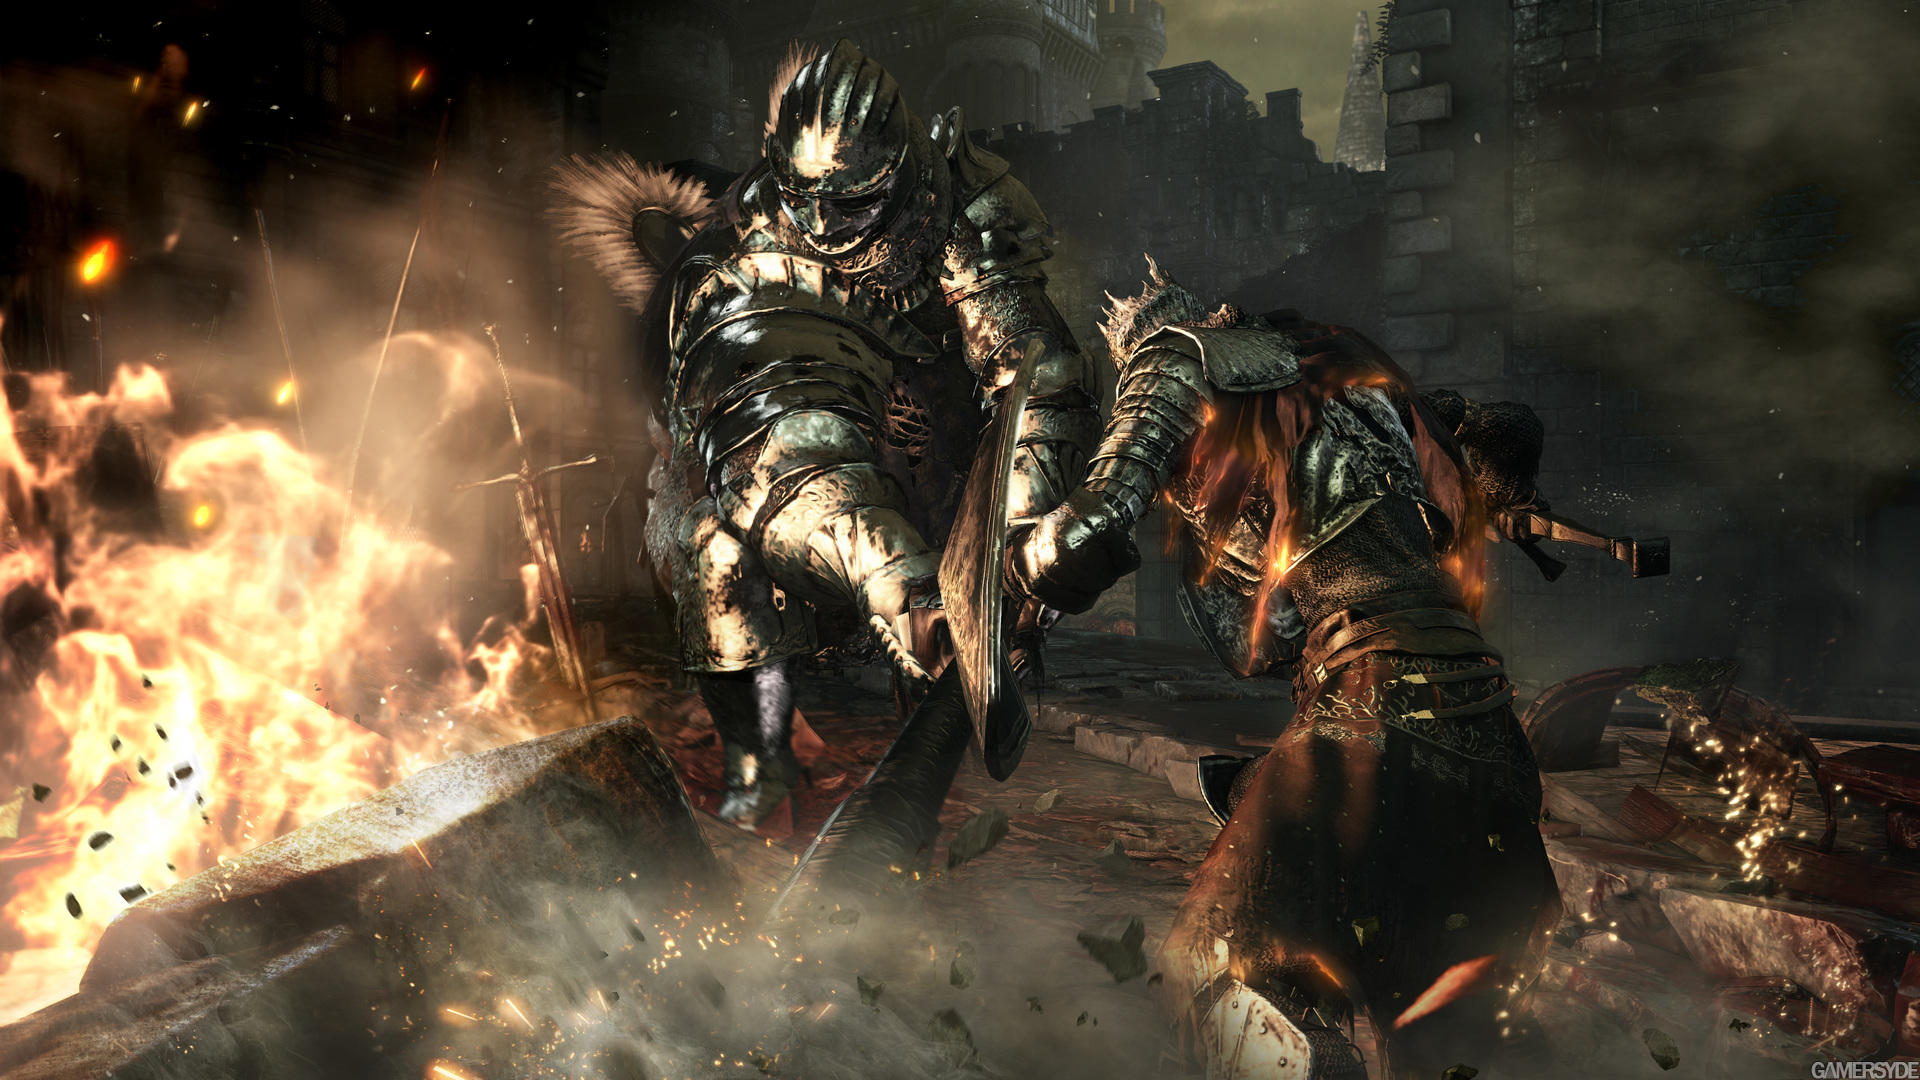 Dark Souls 3 Screenshoot HD Wallpaper 1920x1080